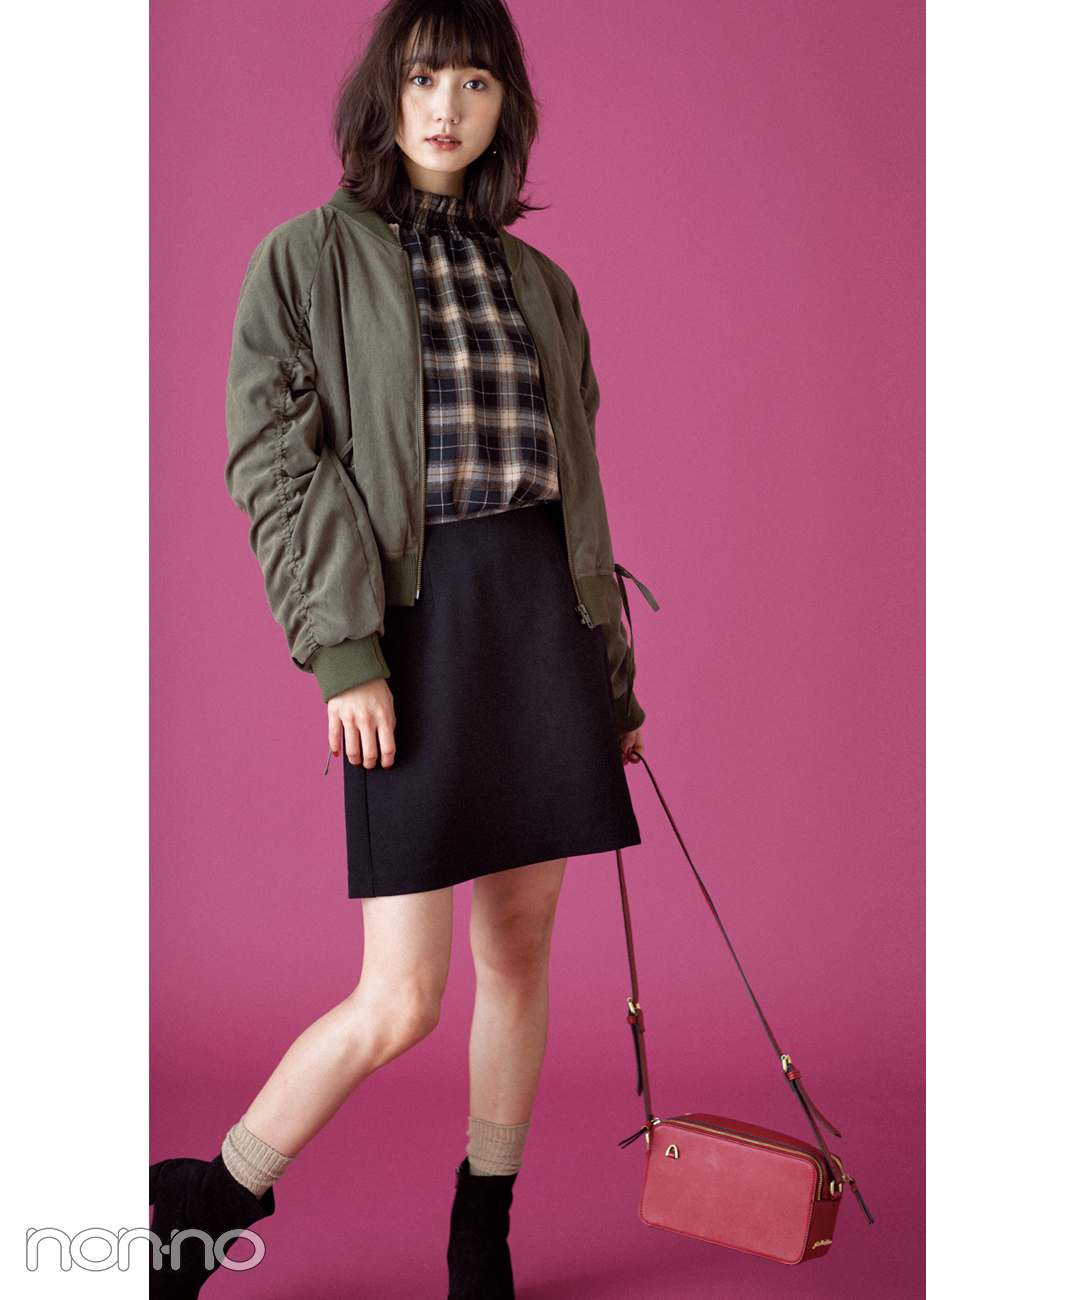 【GUのスカート】台形ミニをヘルシーに着こなしてカッコ可愛く!